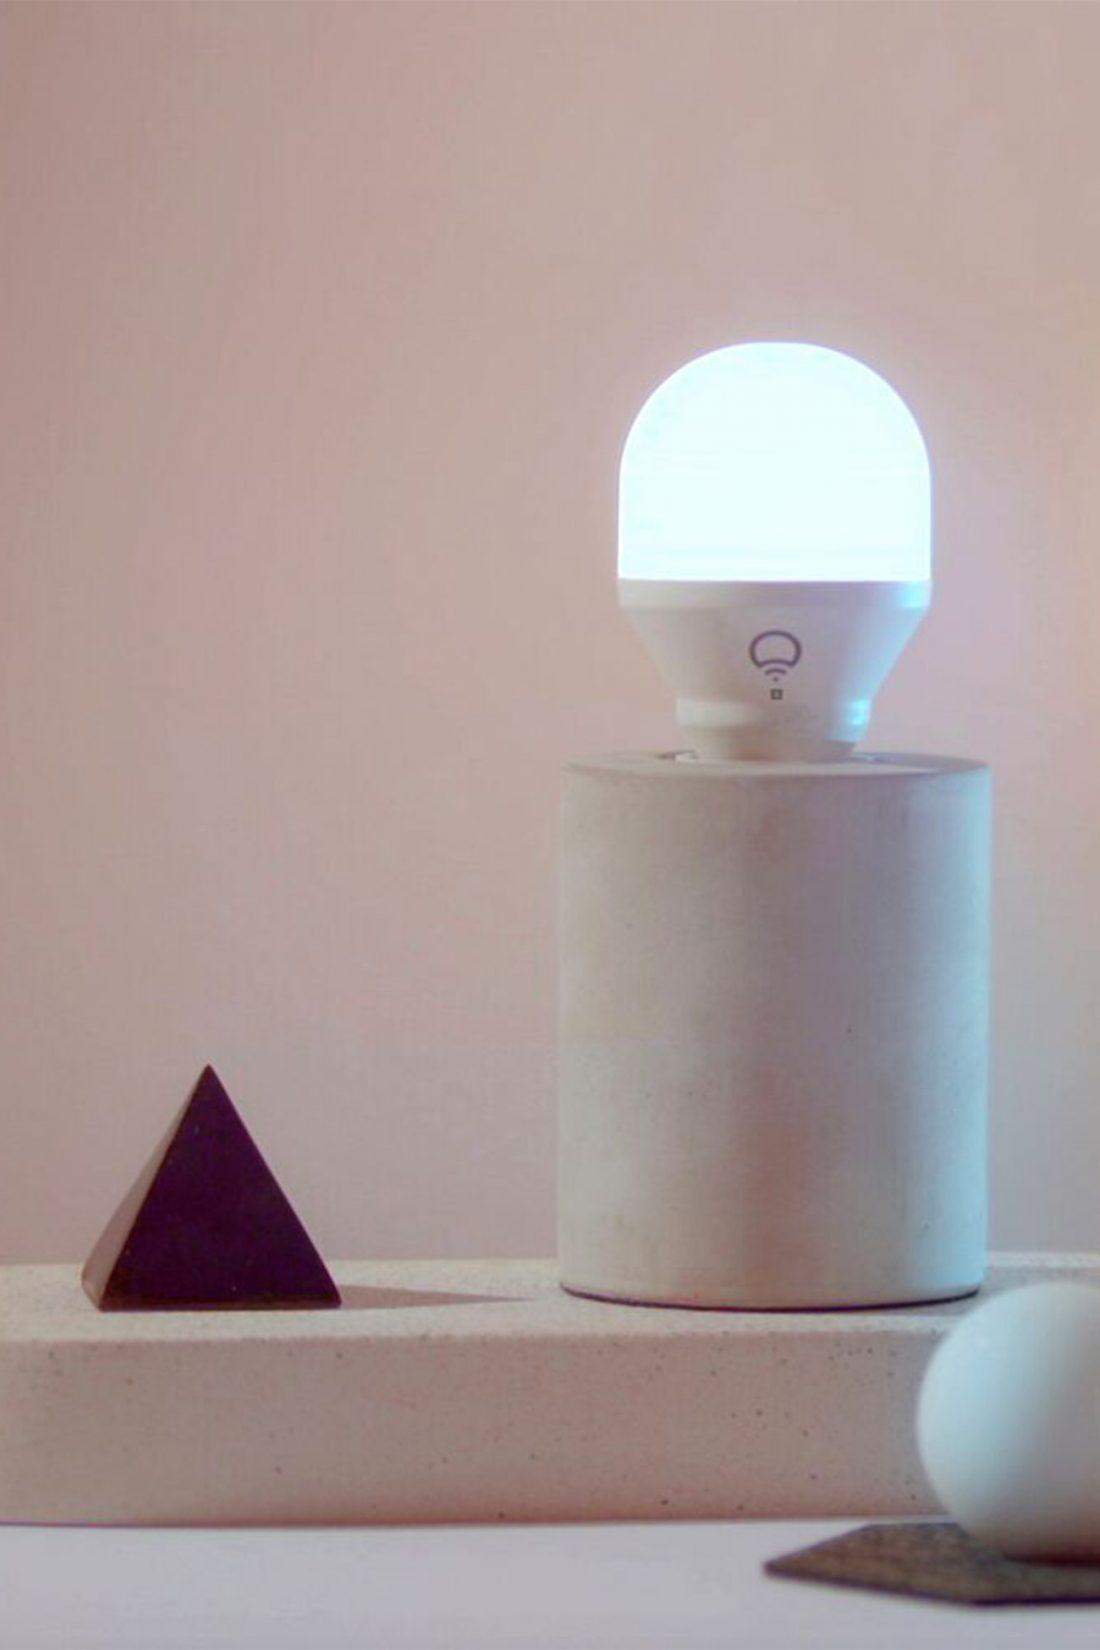 Lifx Mini Day to Dusk: Smart Lighting